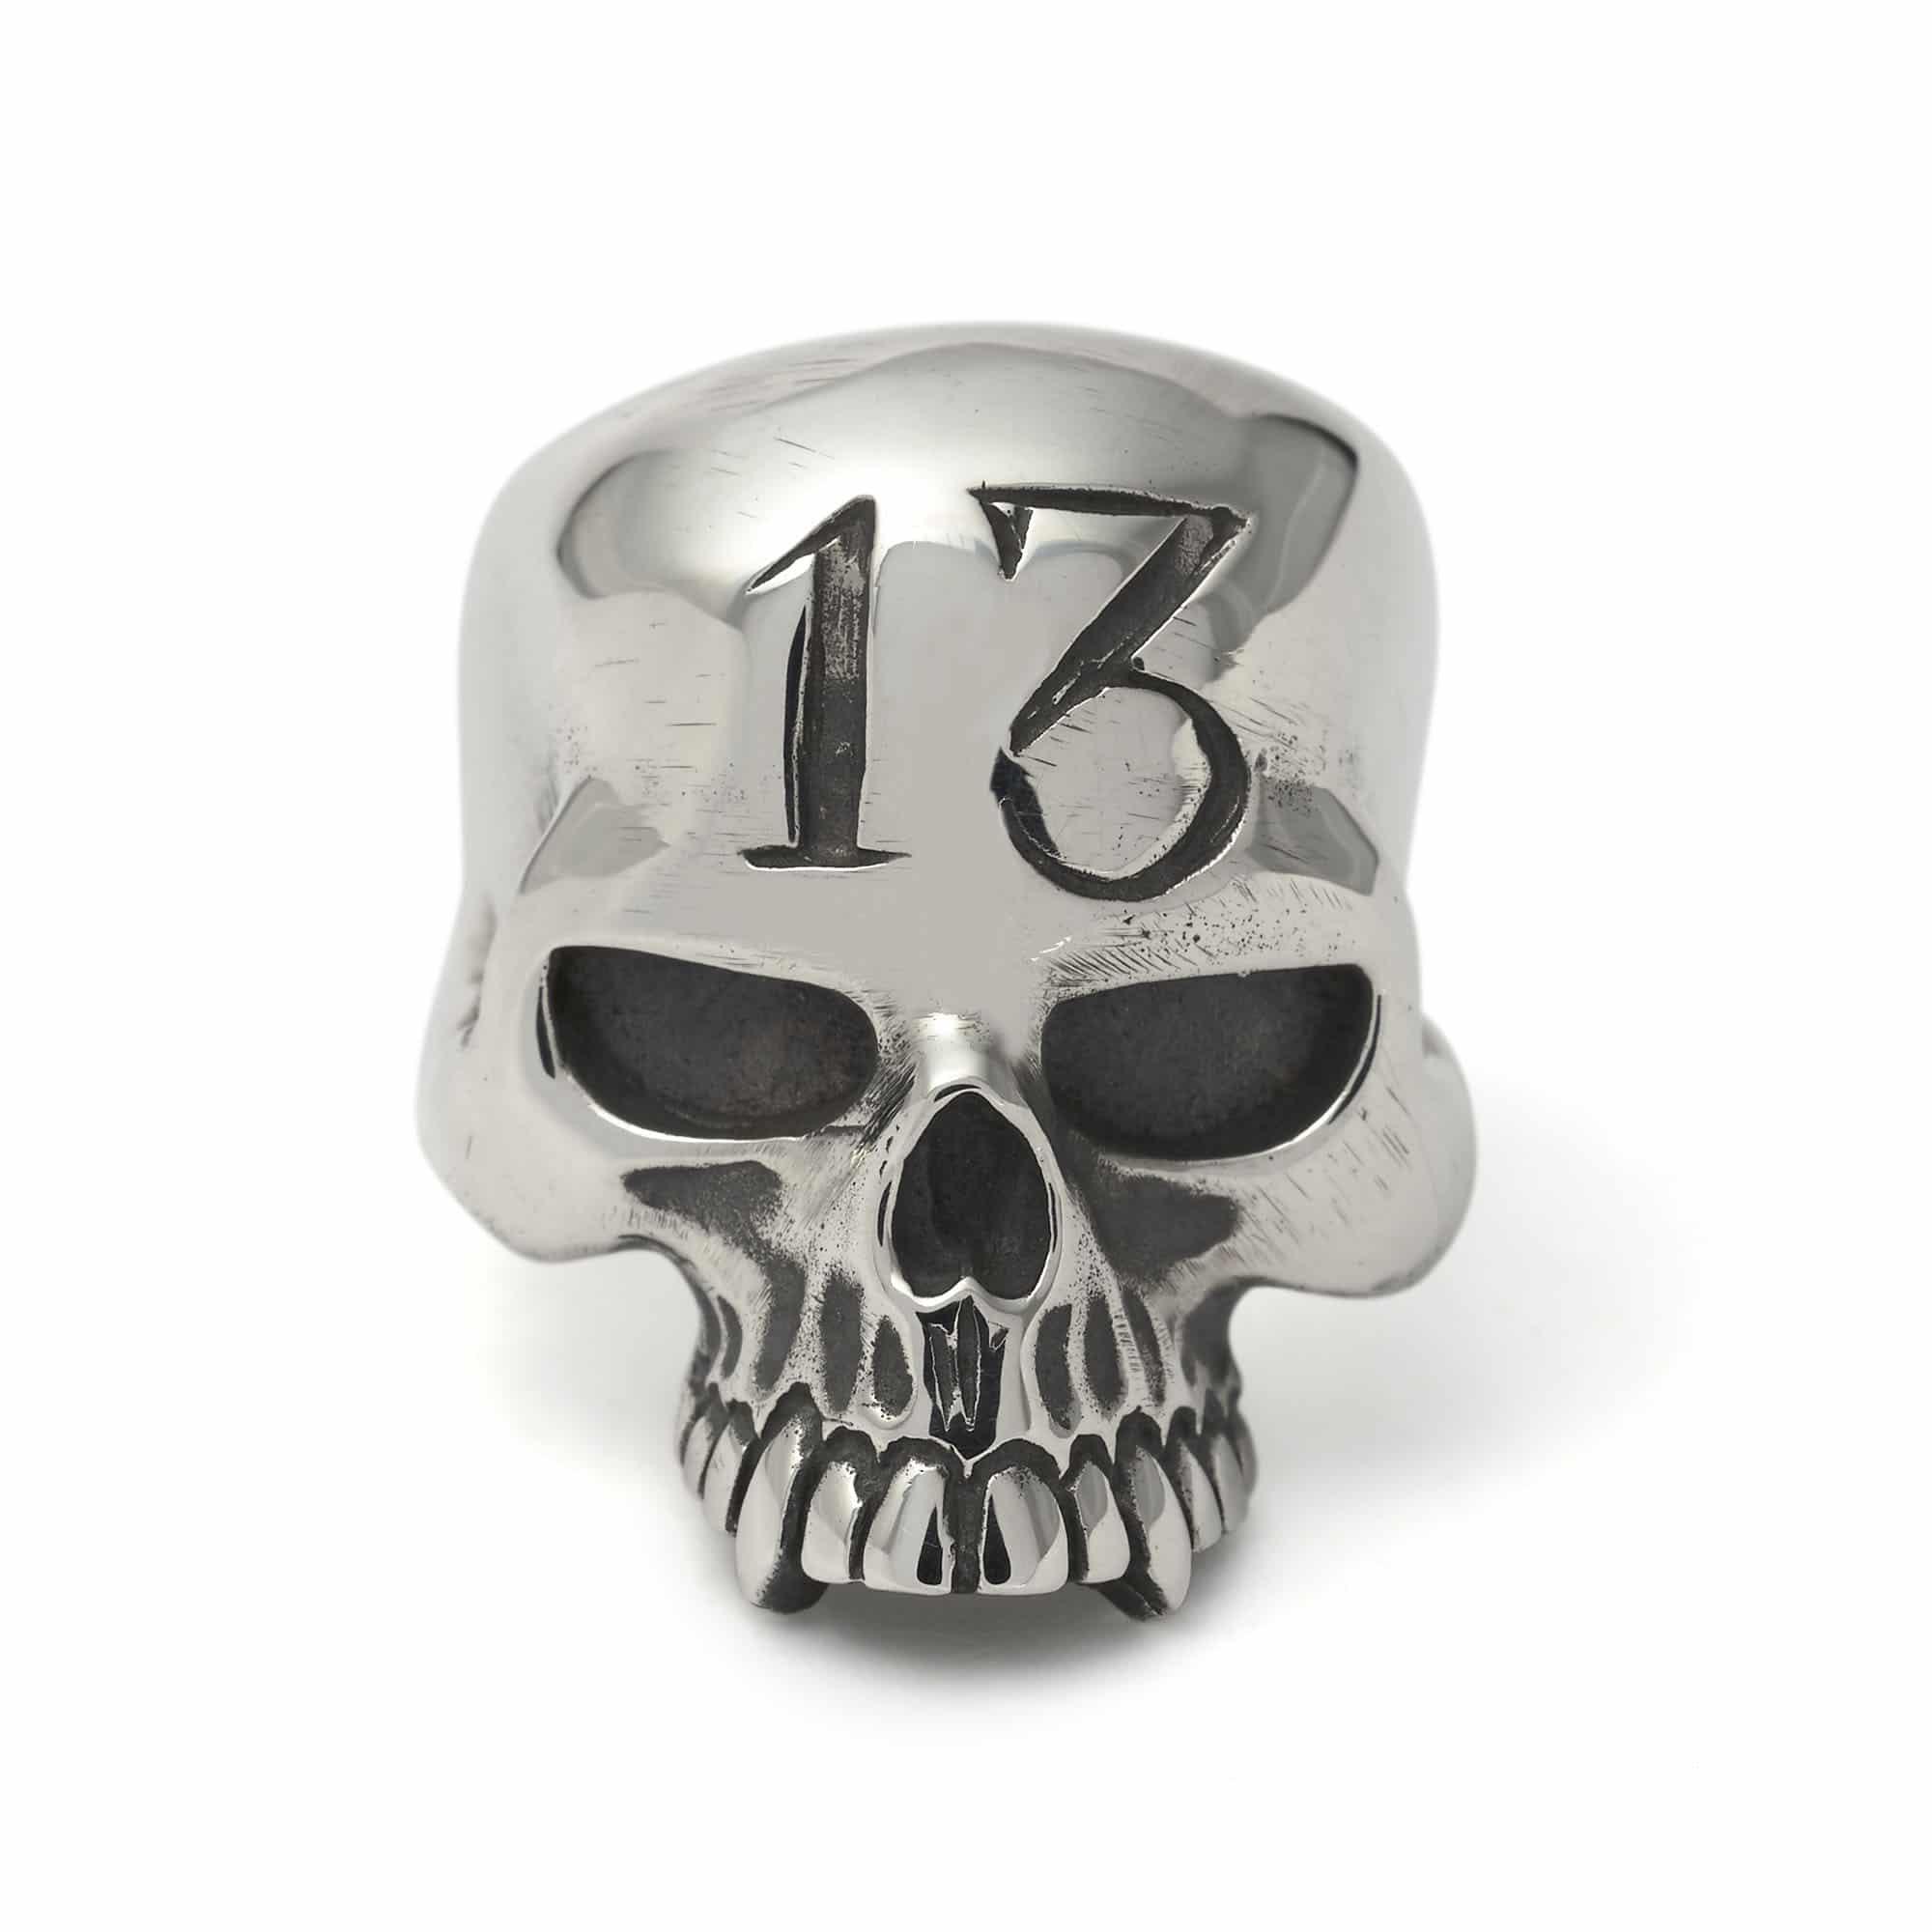 13 Evil Skull Ring – The Great Frog